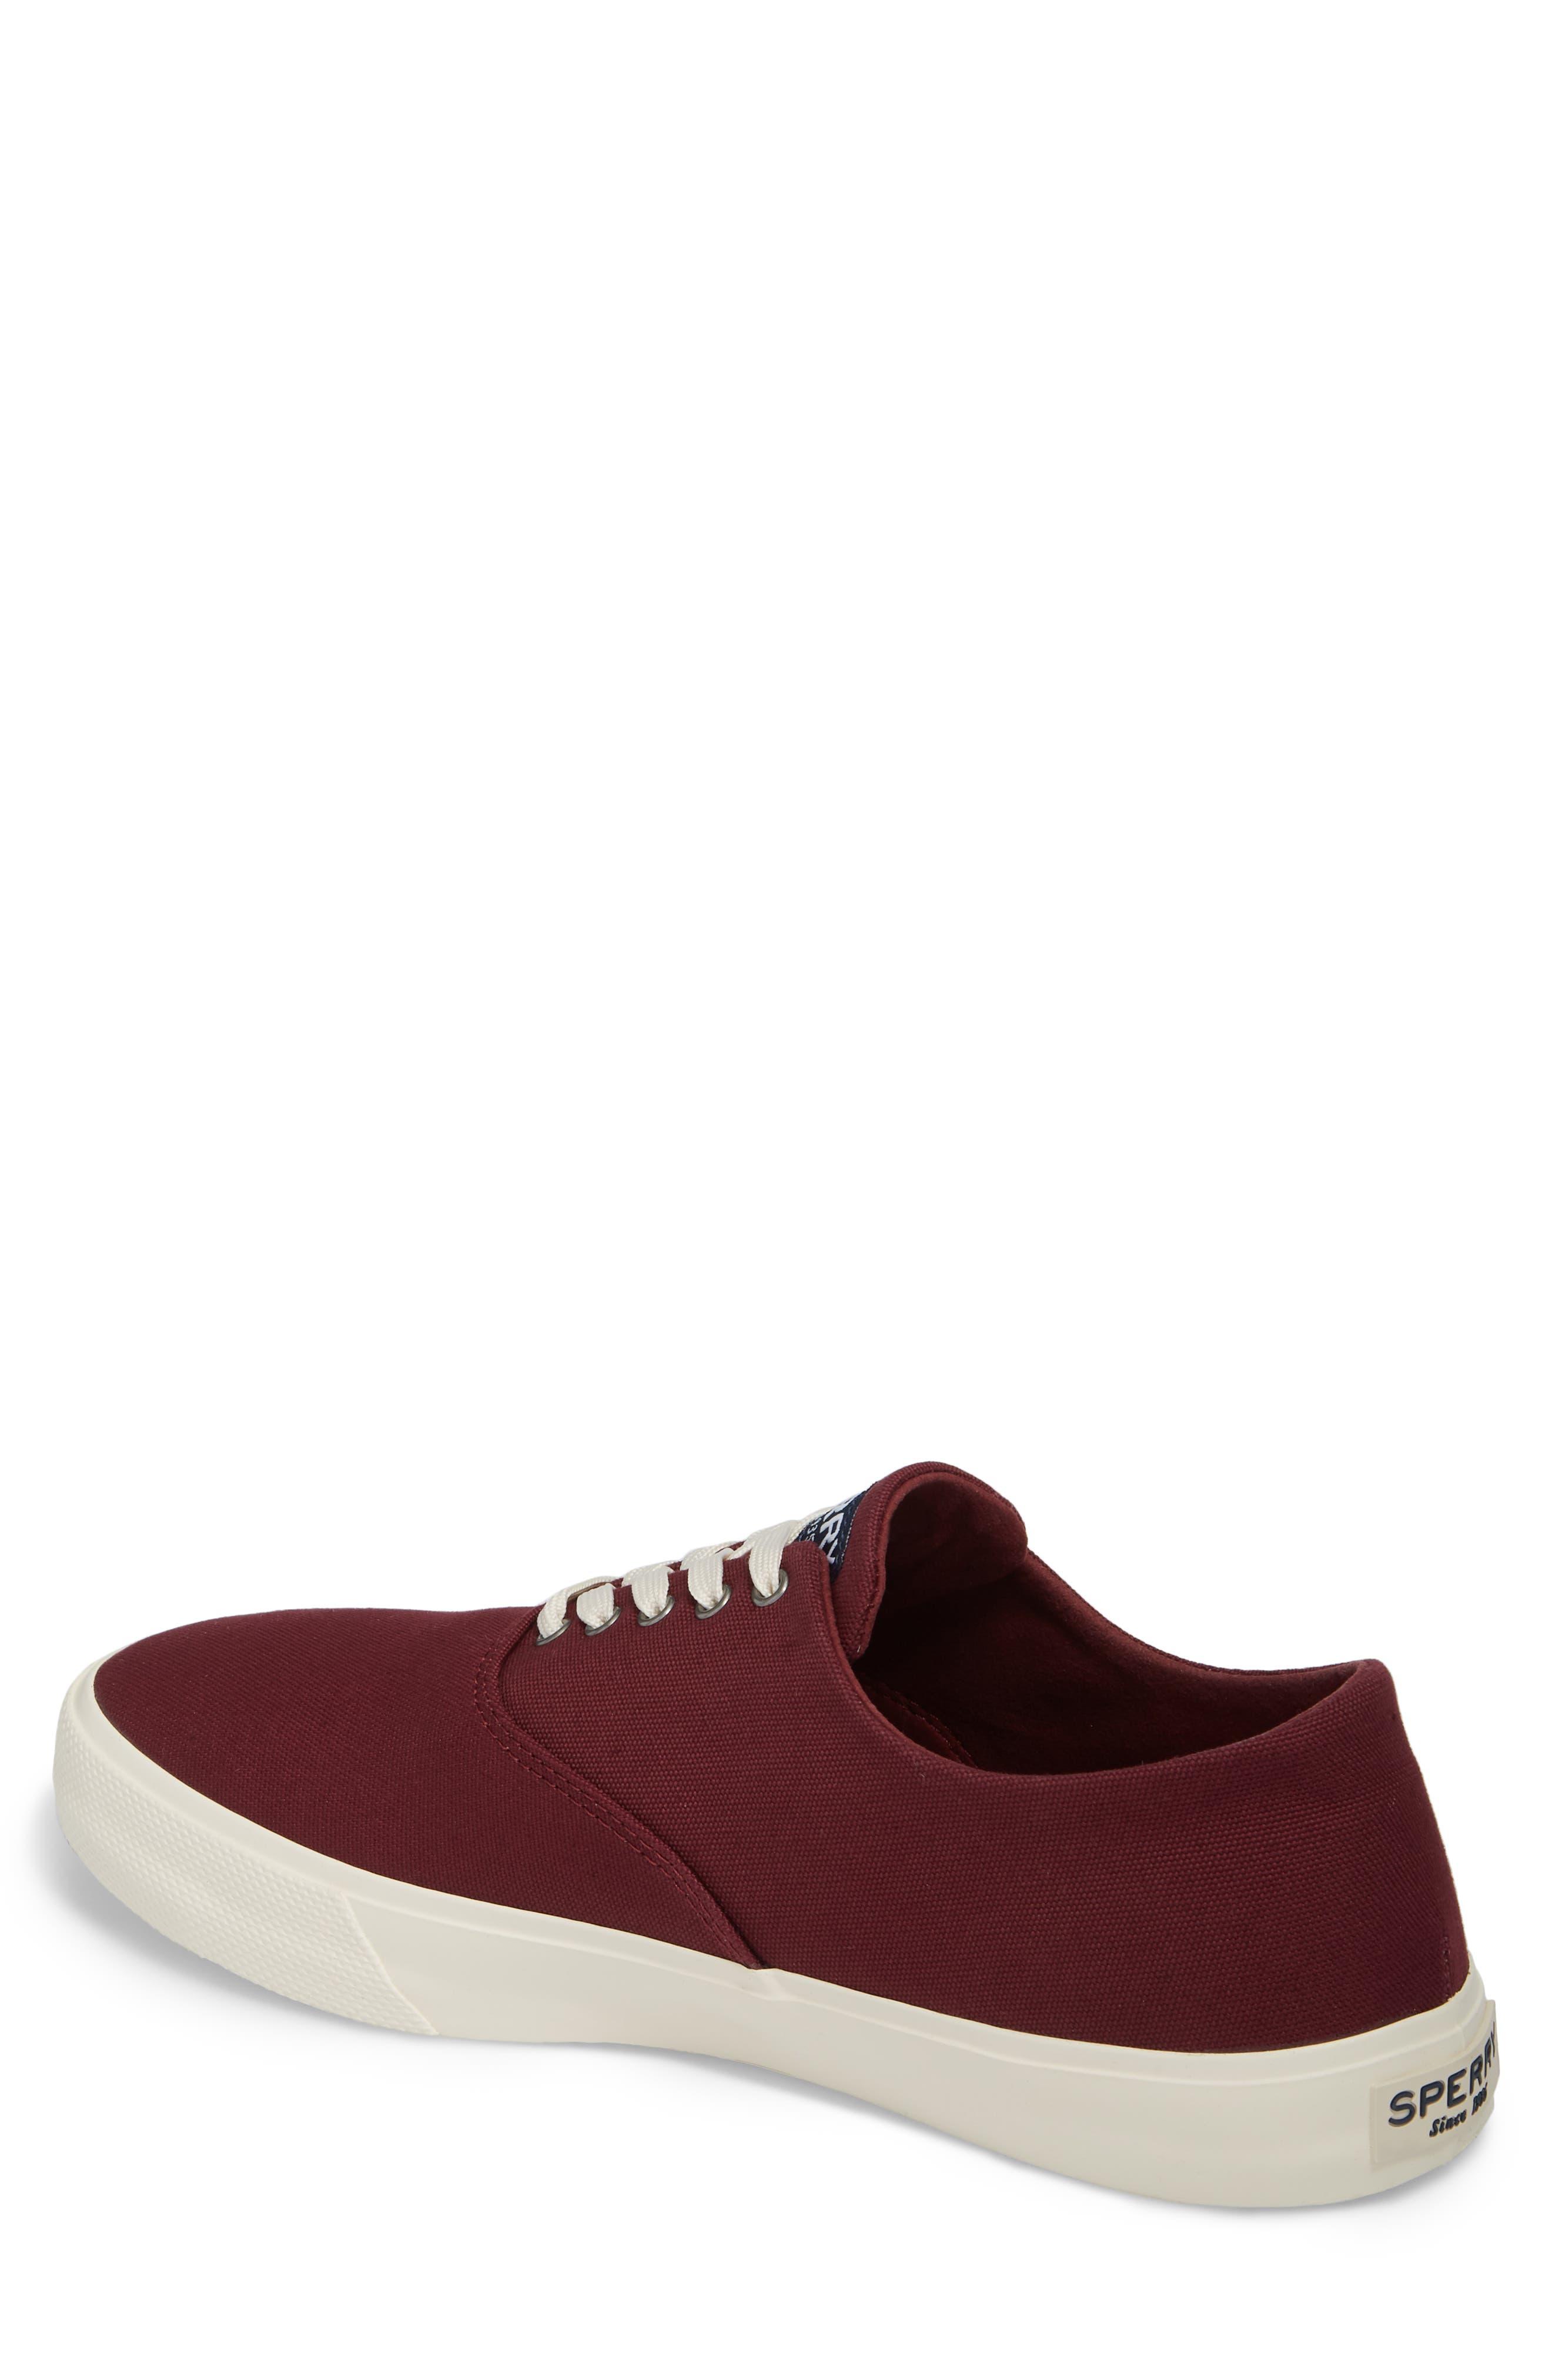 Captain's CVO Sneaker,                             Alternate thumbnail 2, color,                             WINE FABRIC